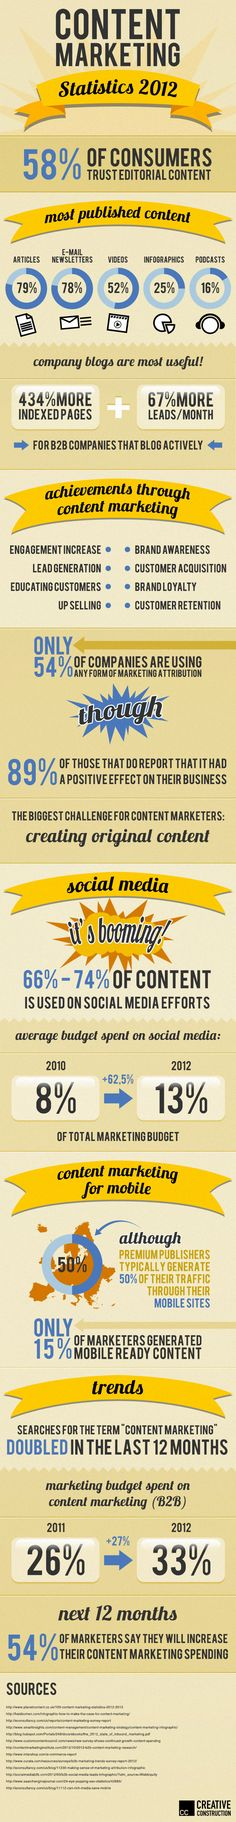 #ContentMarketing Statistics 2012